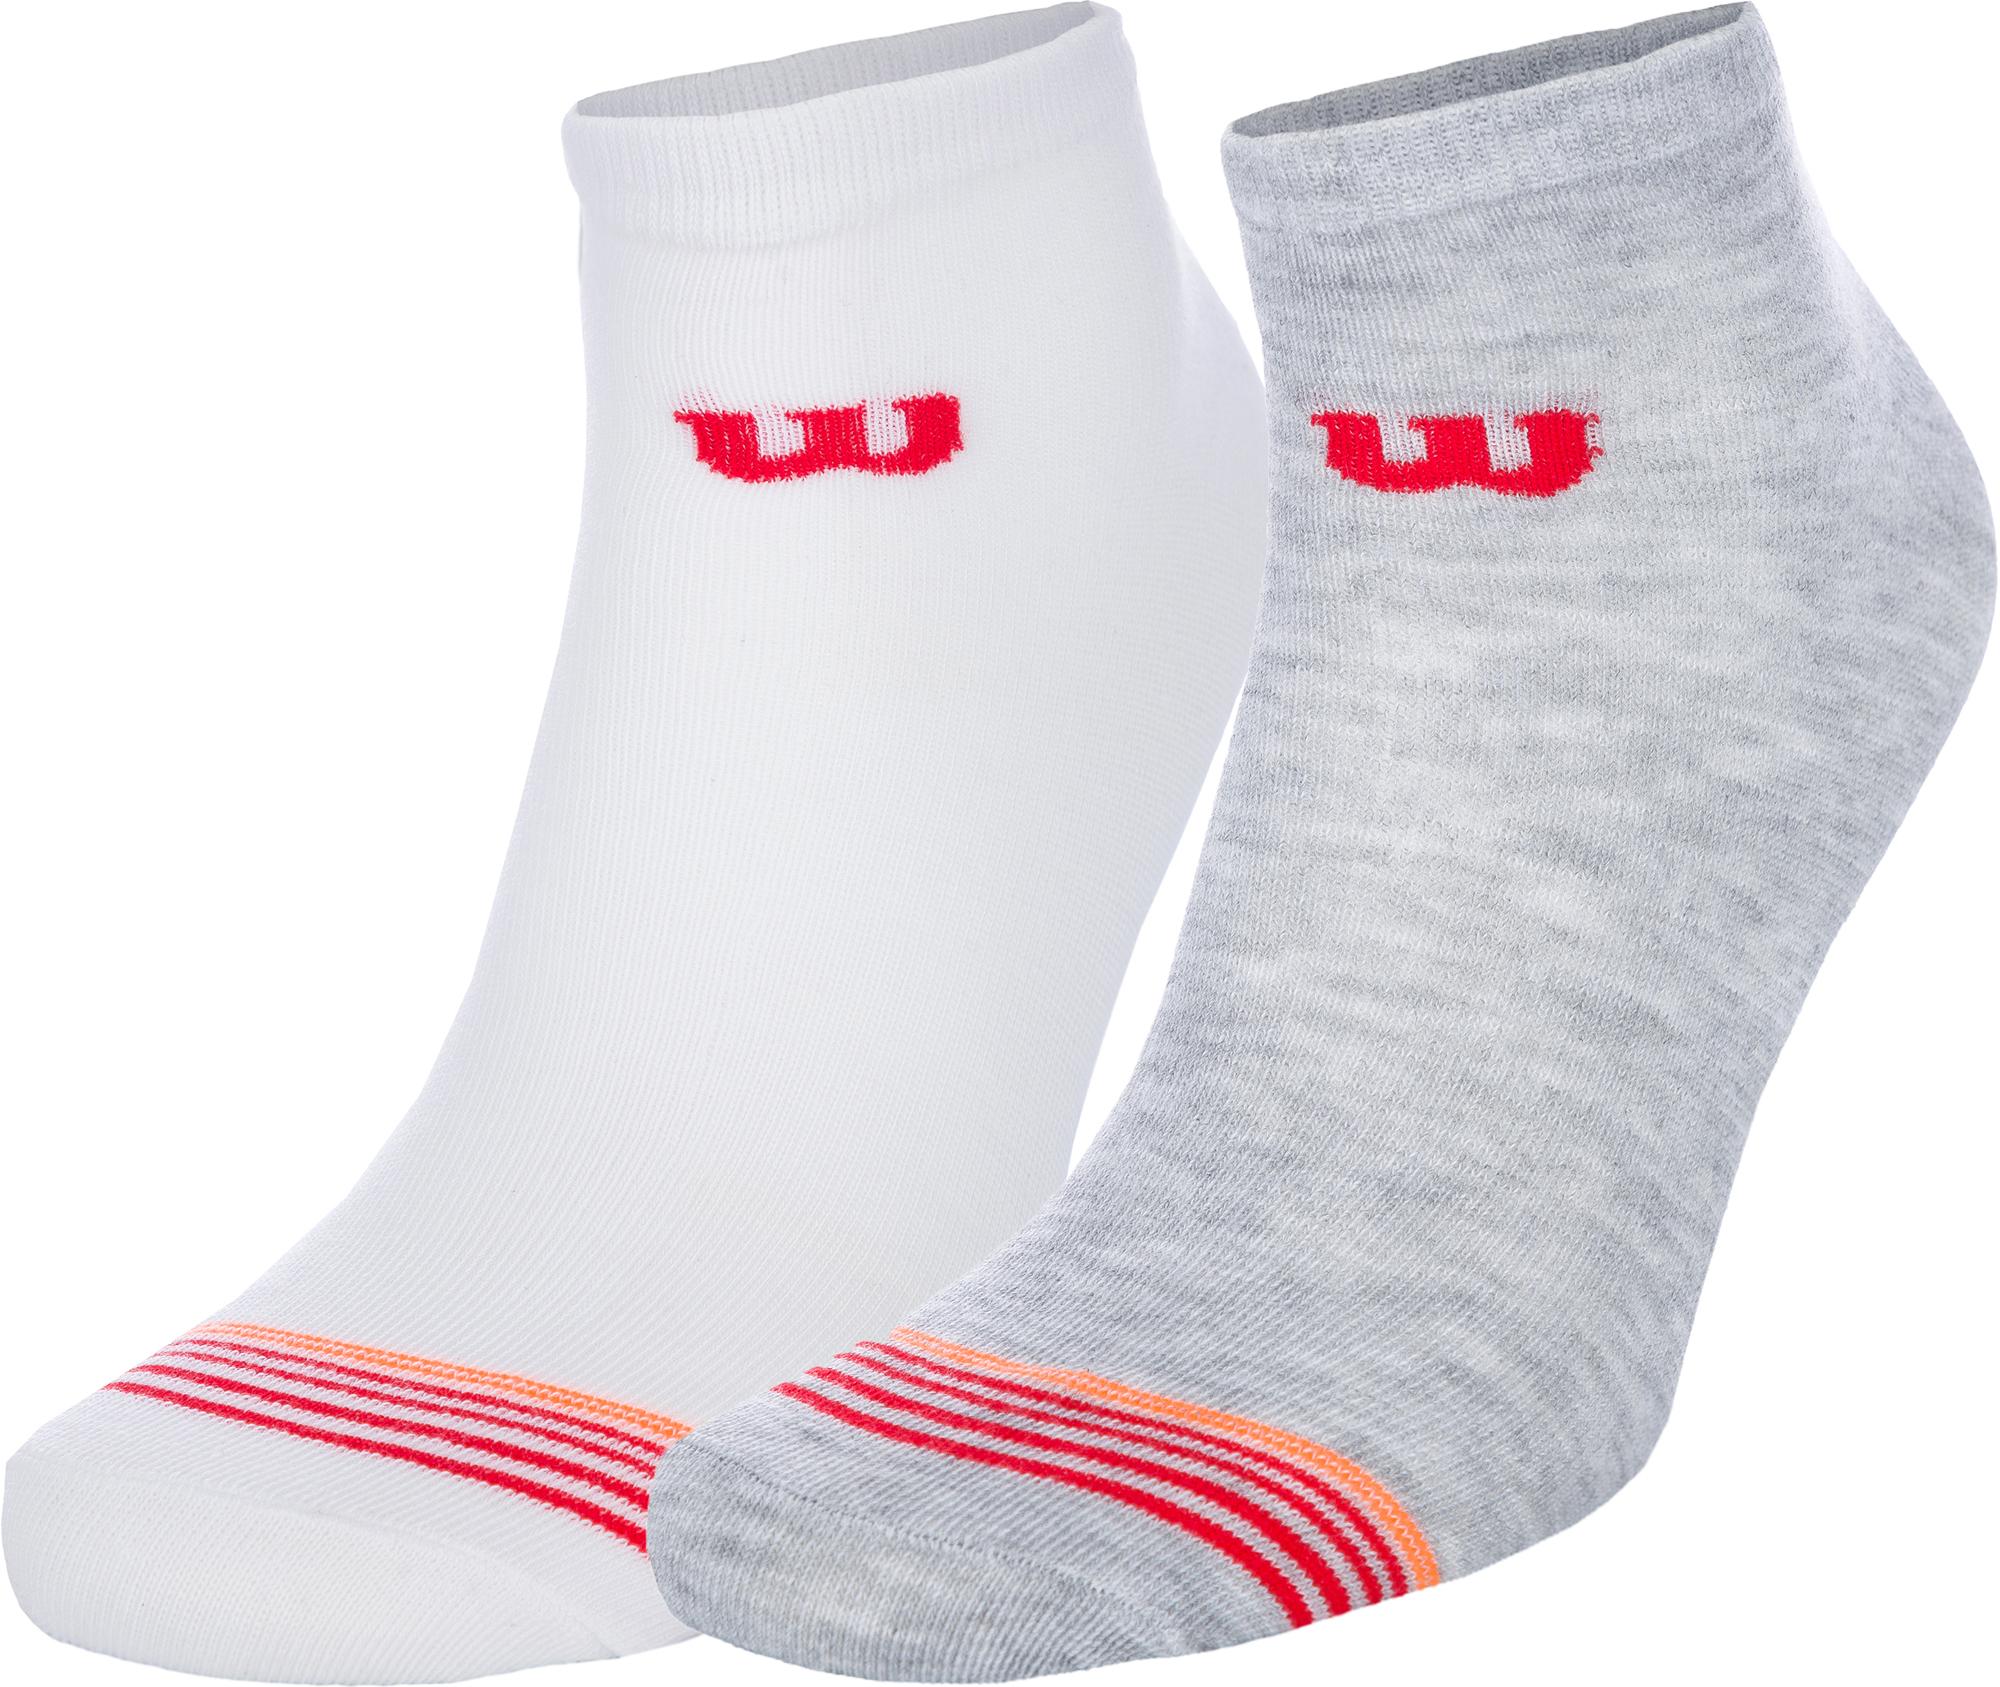 Wilson Носки Wilson, 2 пары, размер 35-38 wilson носки мужские wilson premium 2 пары размер 35 38